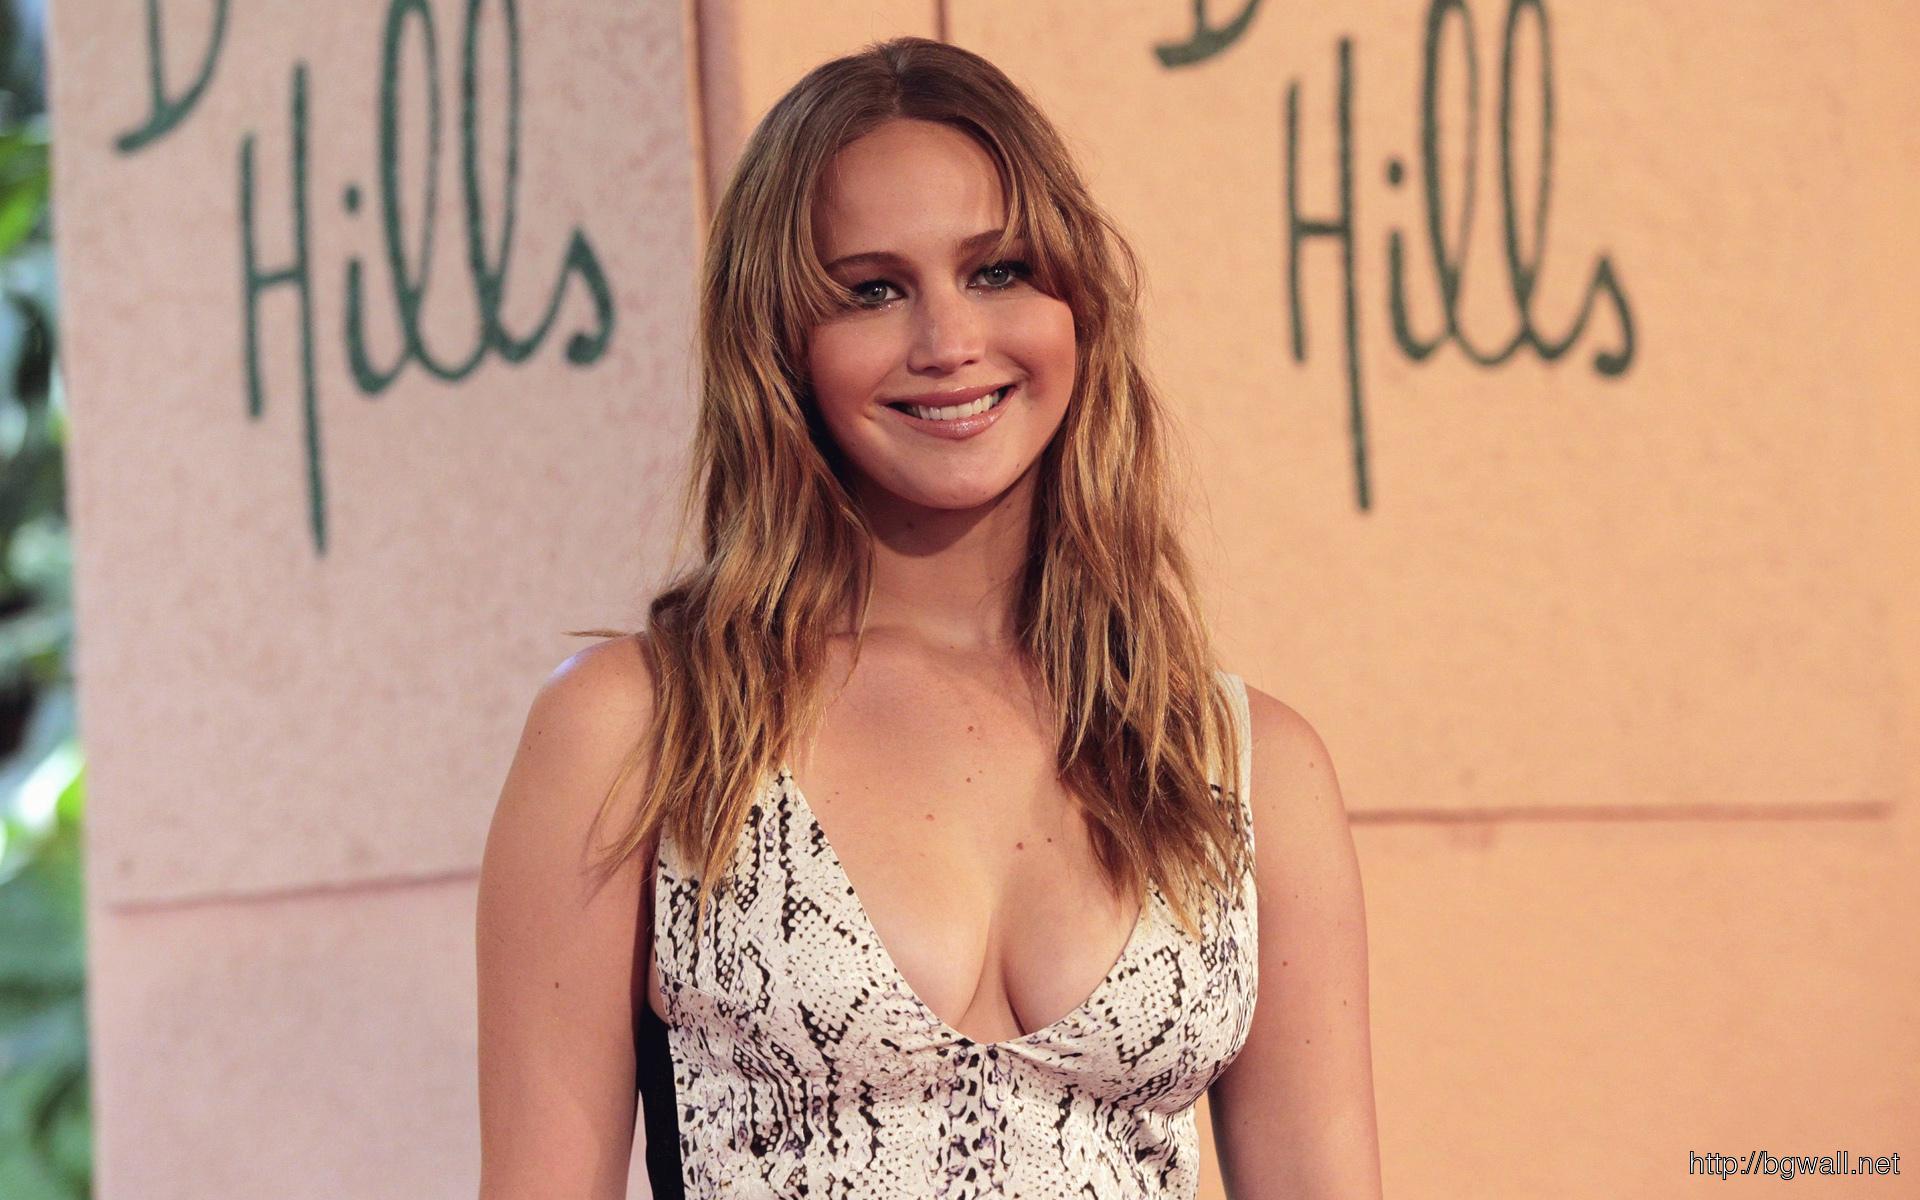 Jennifer Lawrence Hot Hd Wallpaper Full Size